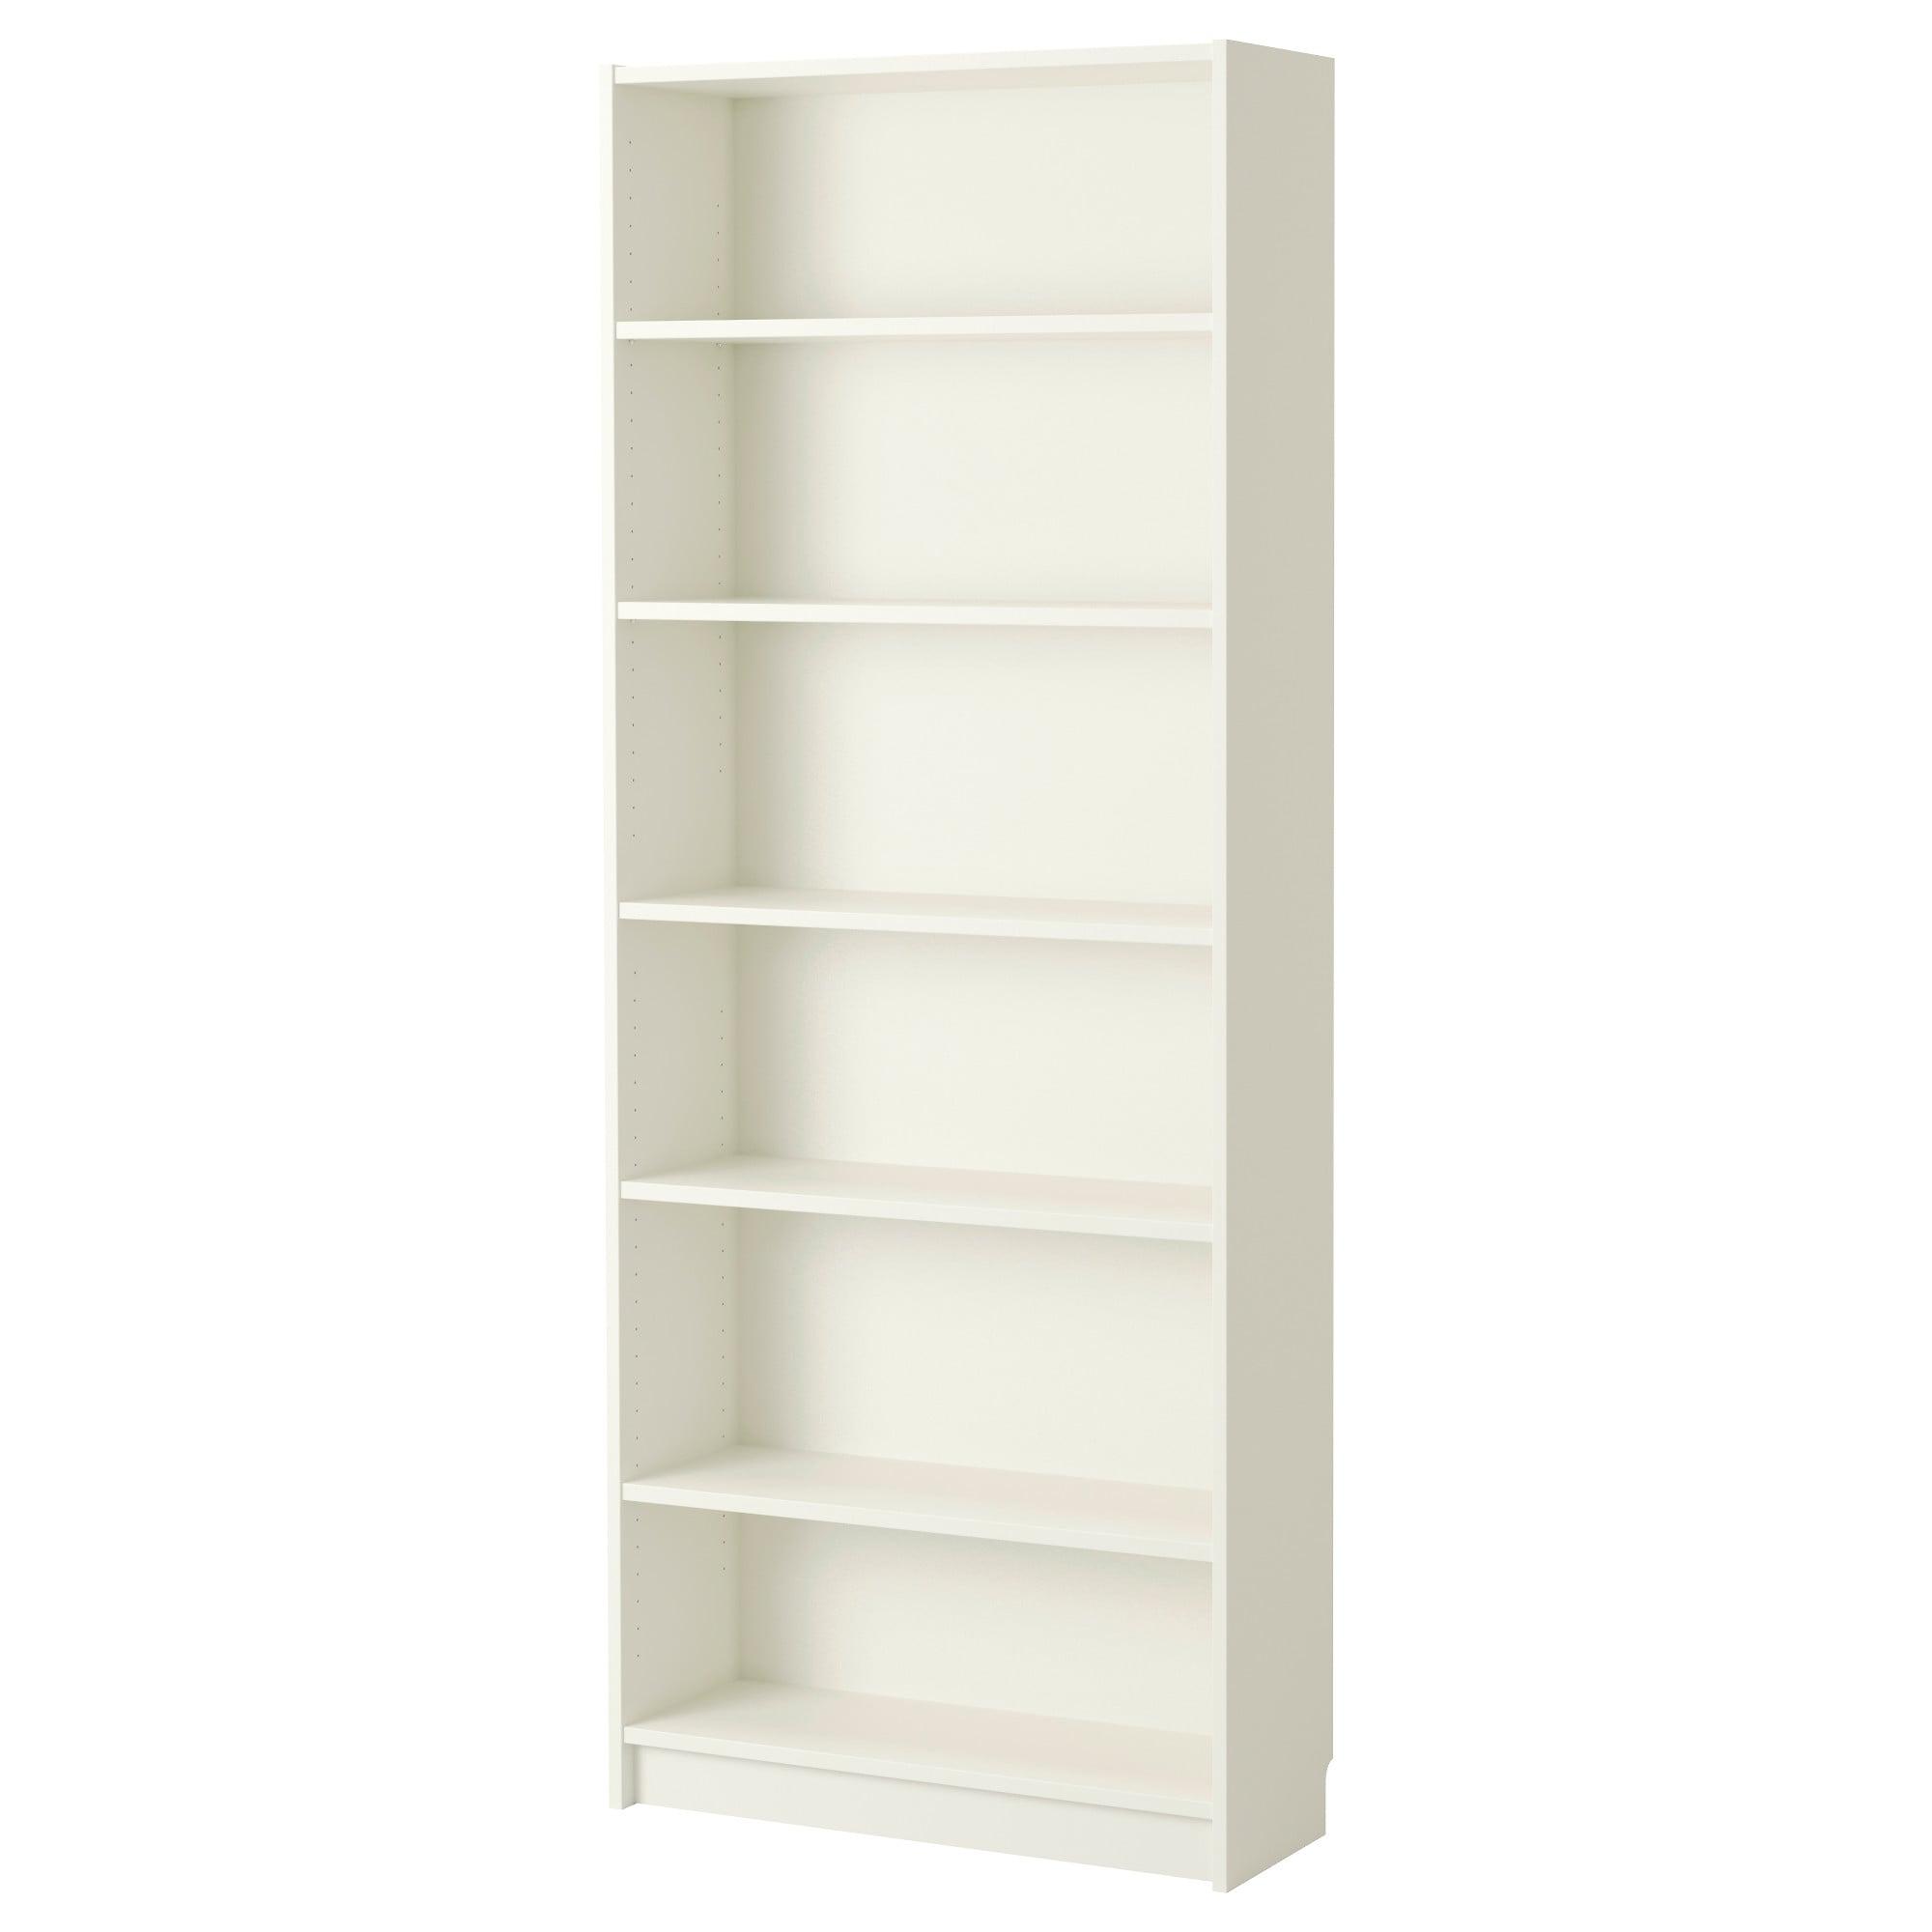 Billy Bookcase White 31 1 2x11x79 1 2 Ikea Billy Bookcase